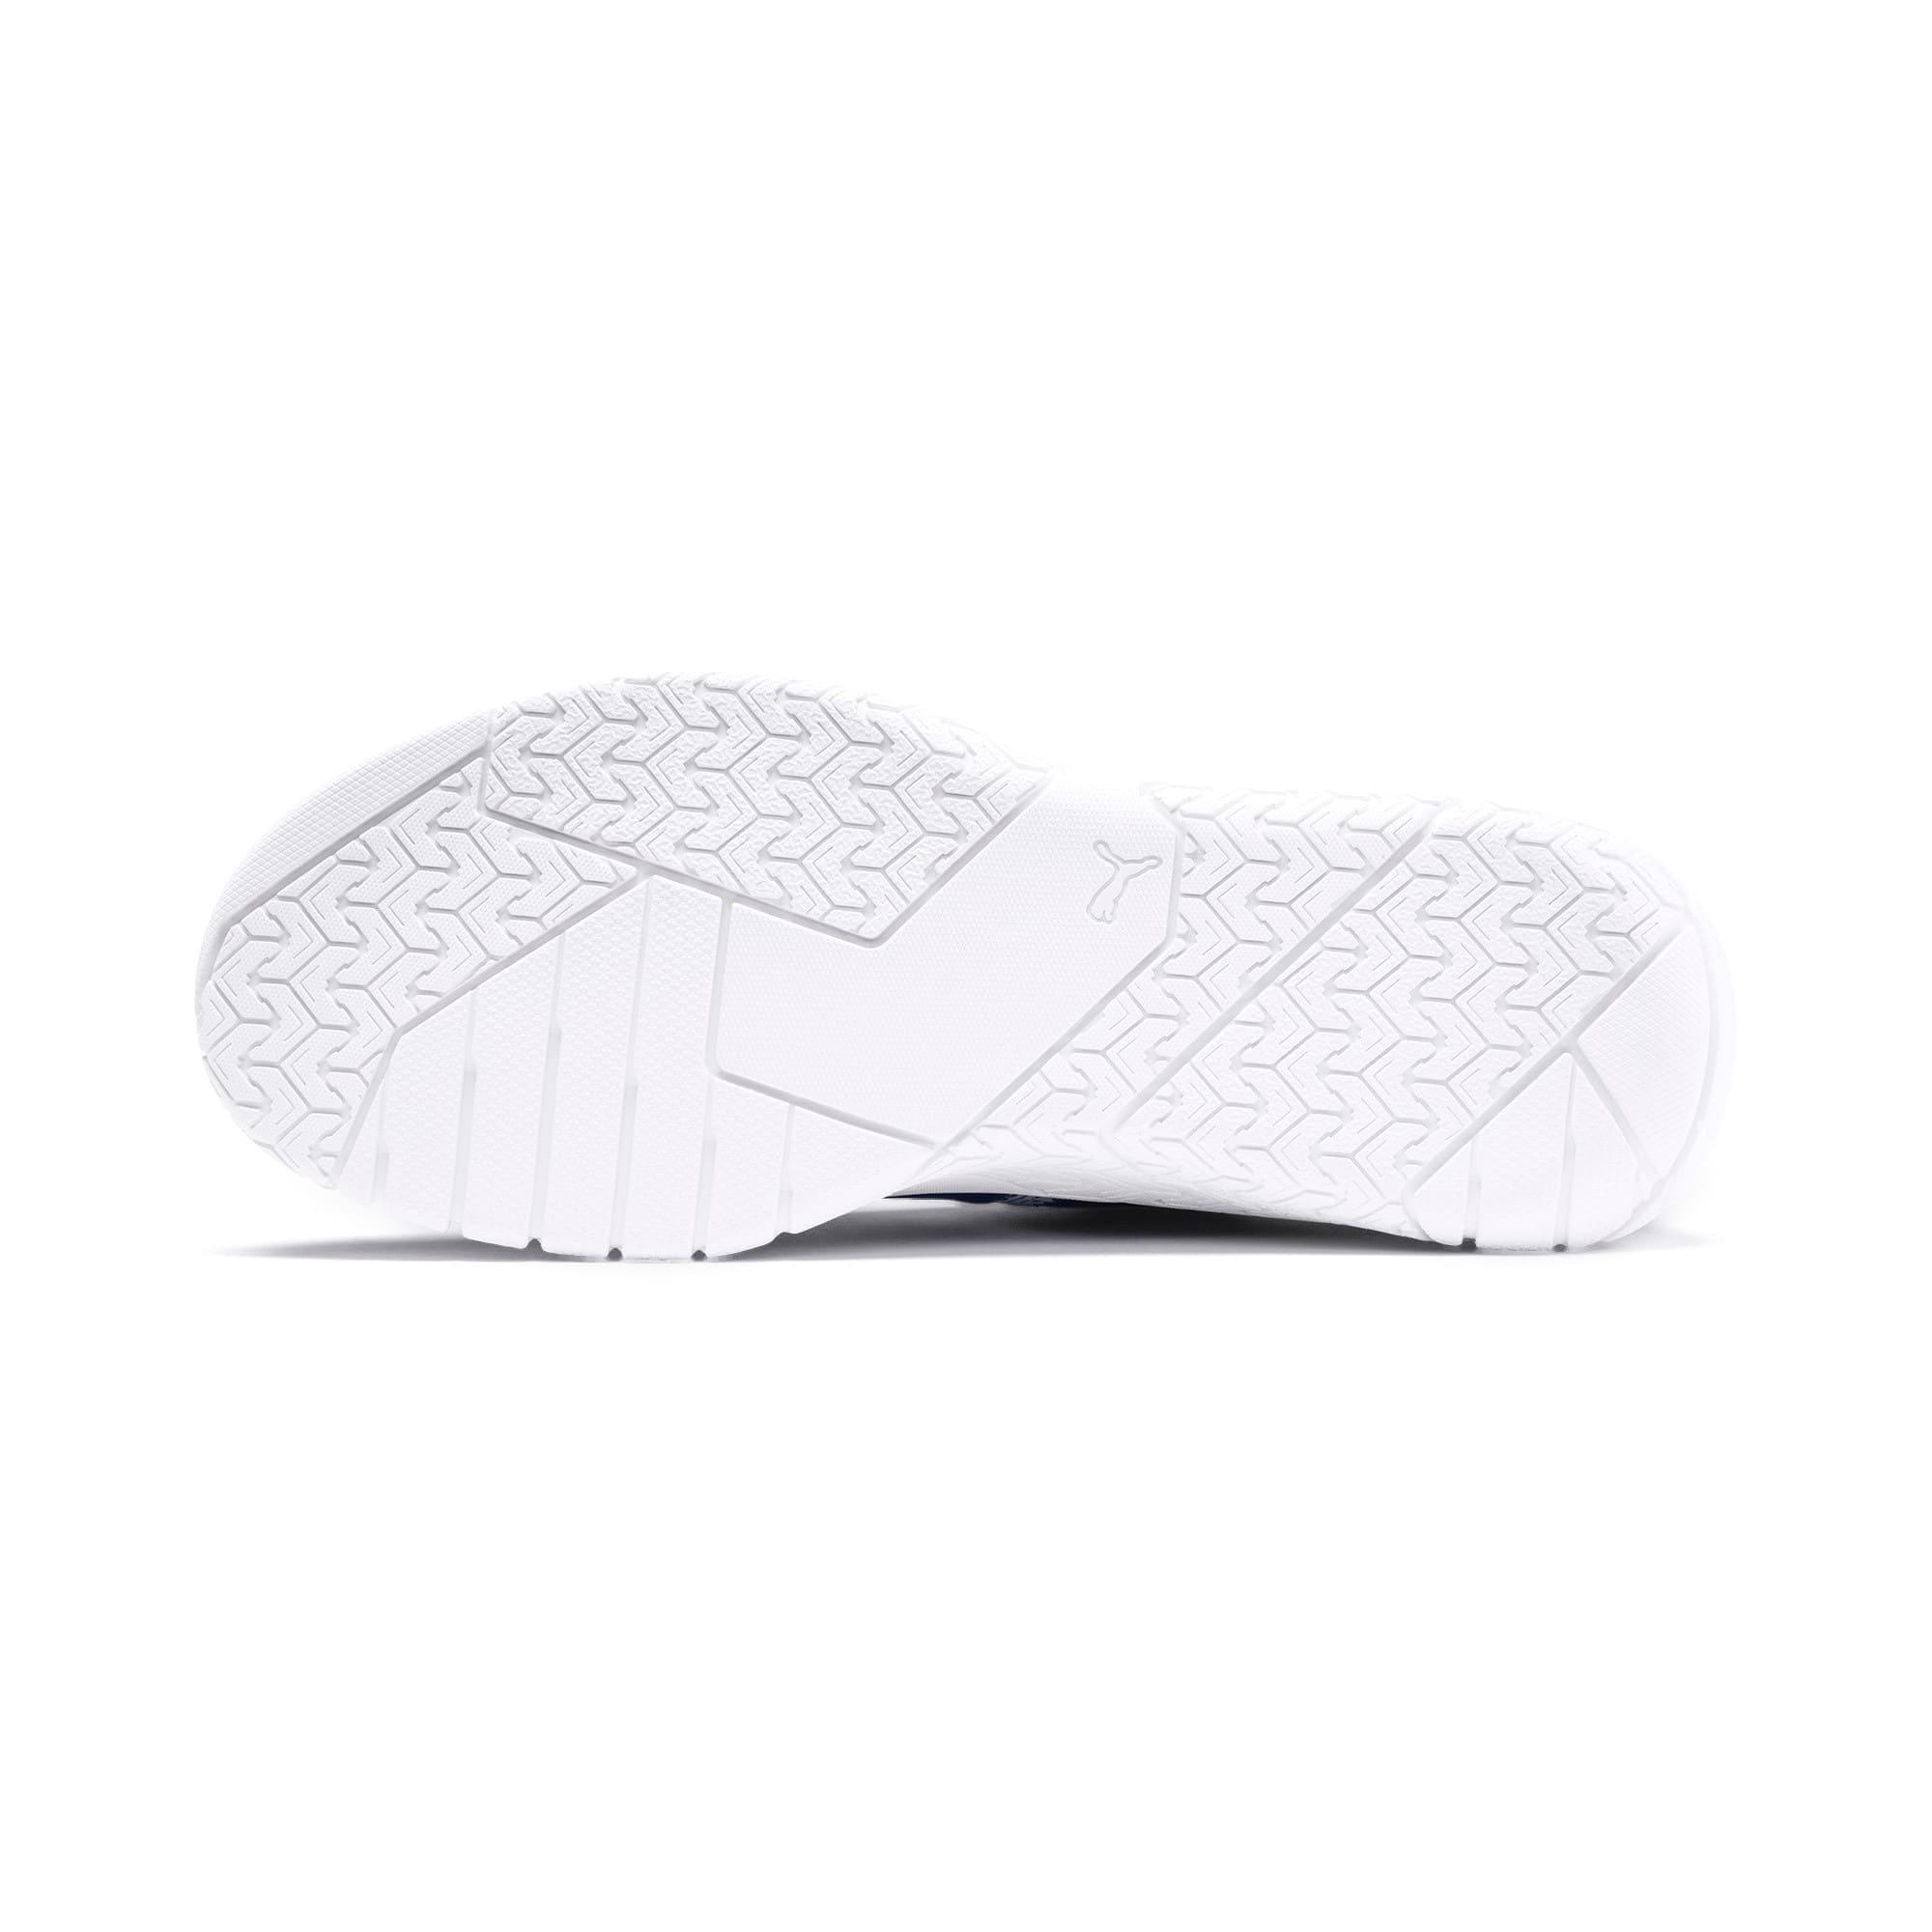 Thumbnail 4 of Replicat-X Circuit Motorsport Shoes, Galaxy Blue-Puma White, medium